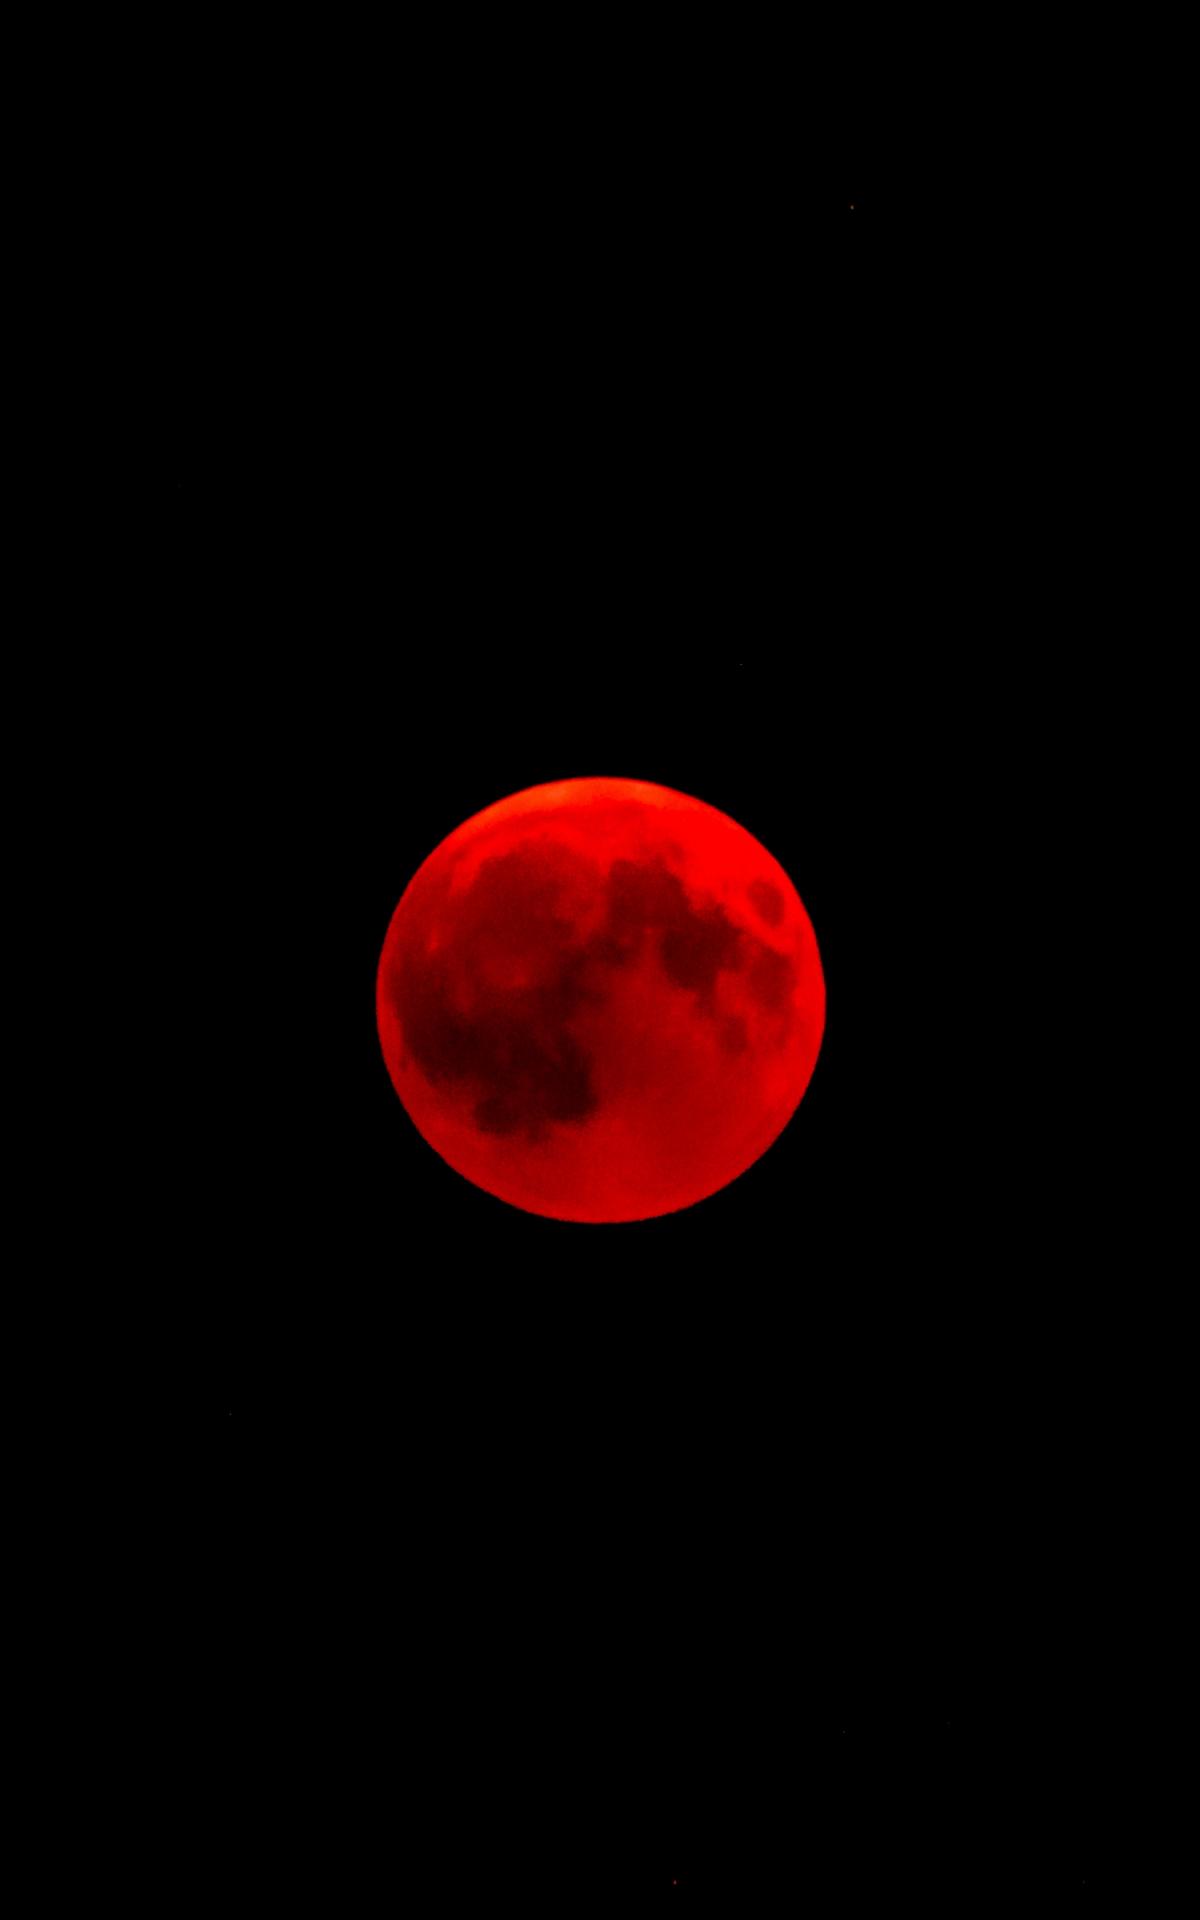 Free download Download wallpaper 3840x2400 moon full moon ...